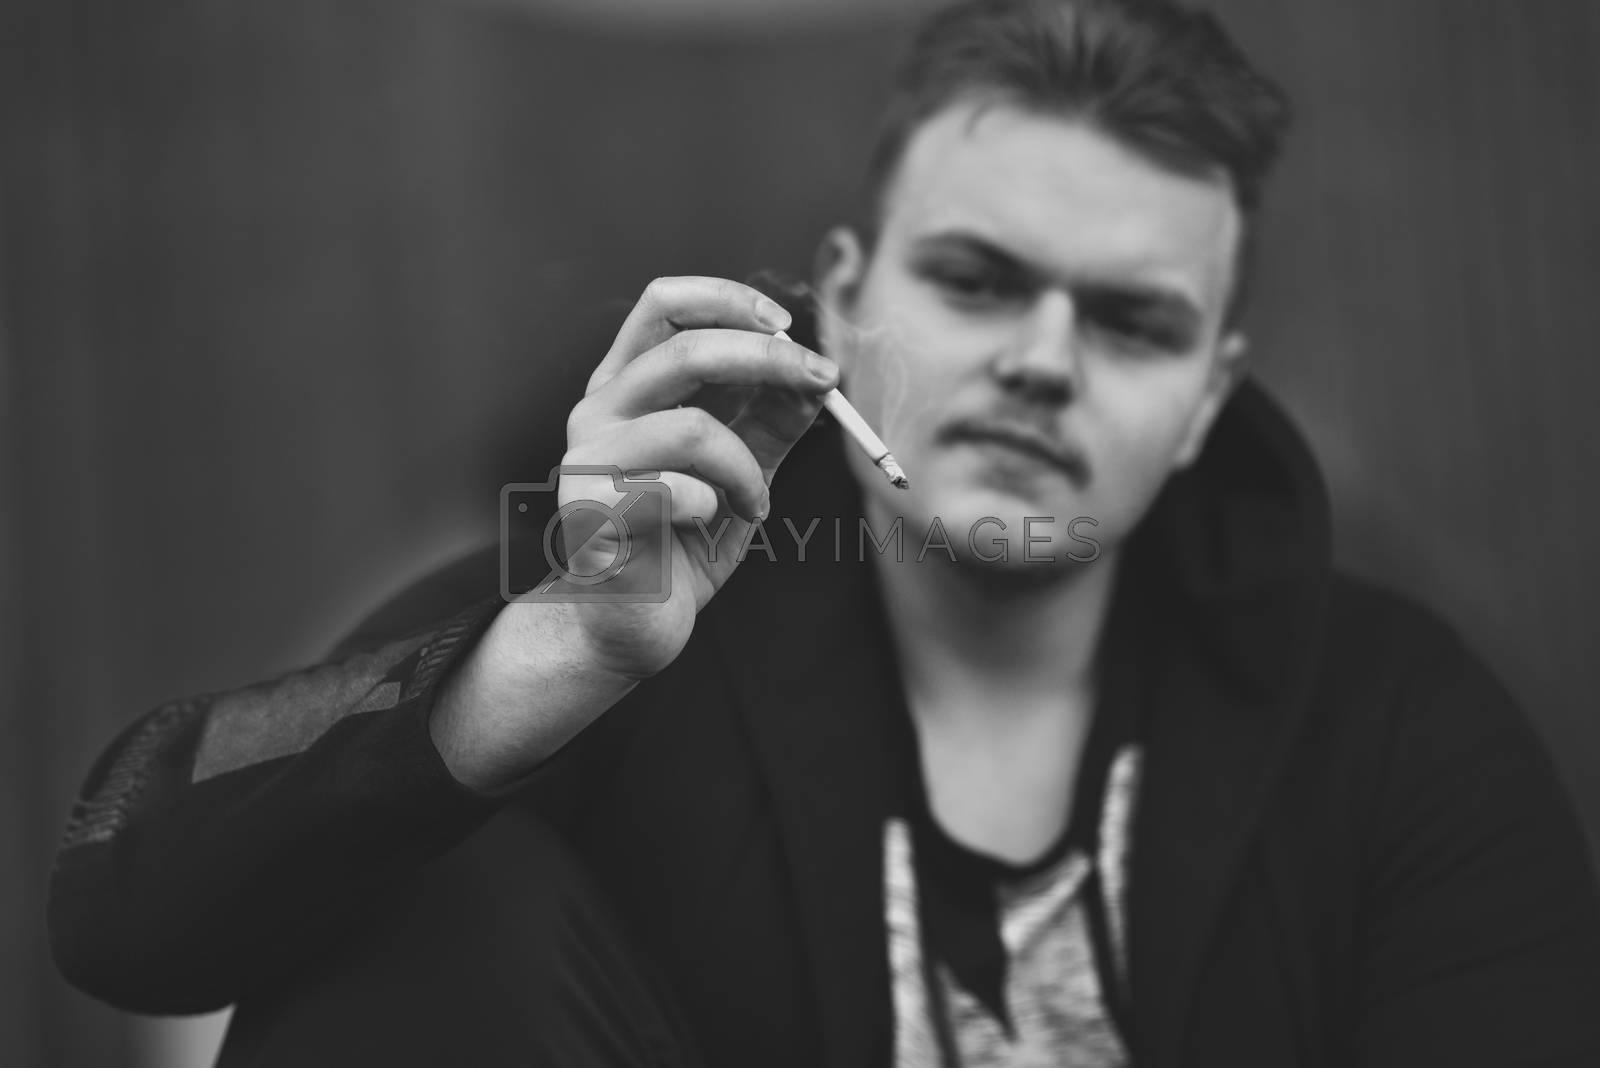 Man smoking cigarette, Close up of an smoking cigarette